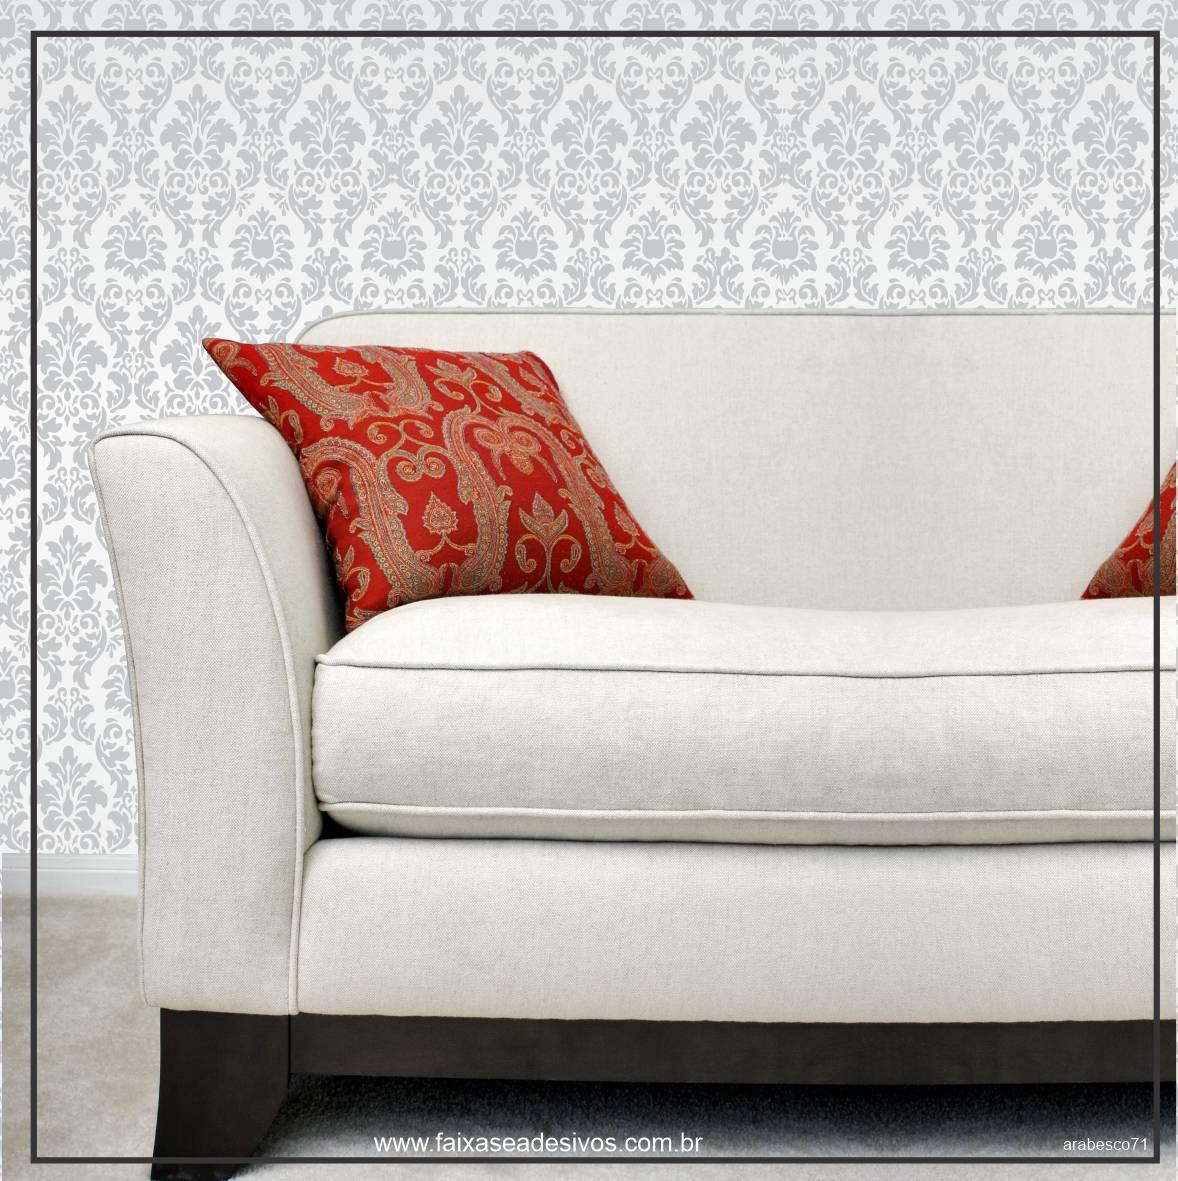 037 - Adesivo Decorativo de parede arabesco cinza - 58cm larg  - Fac Signs